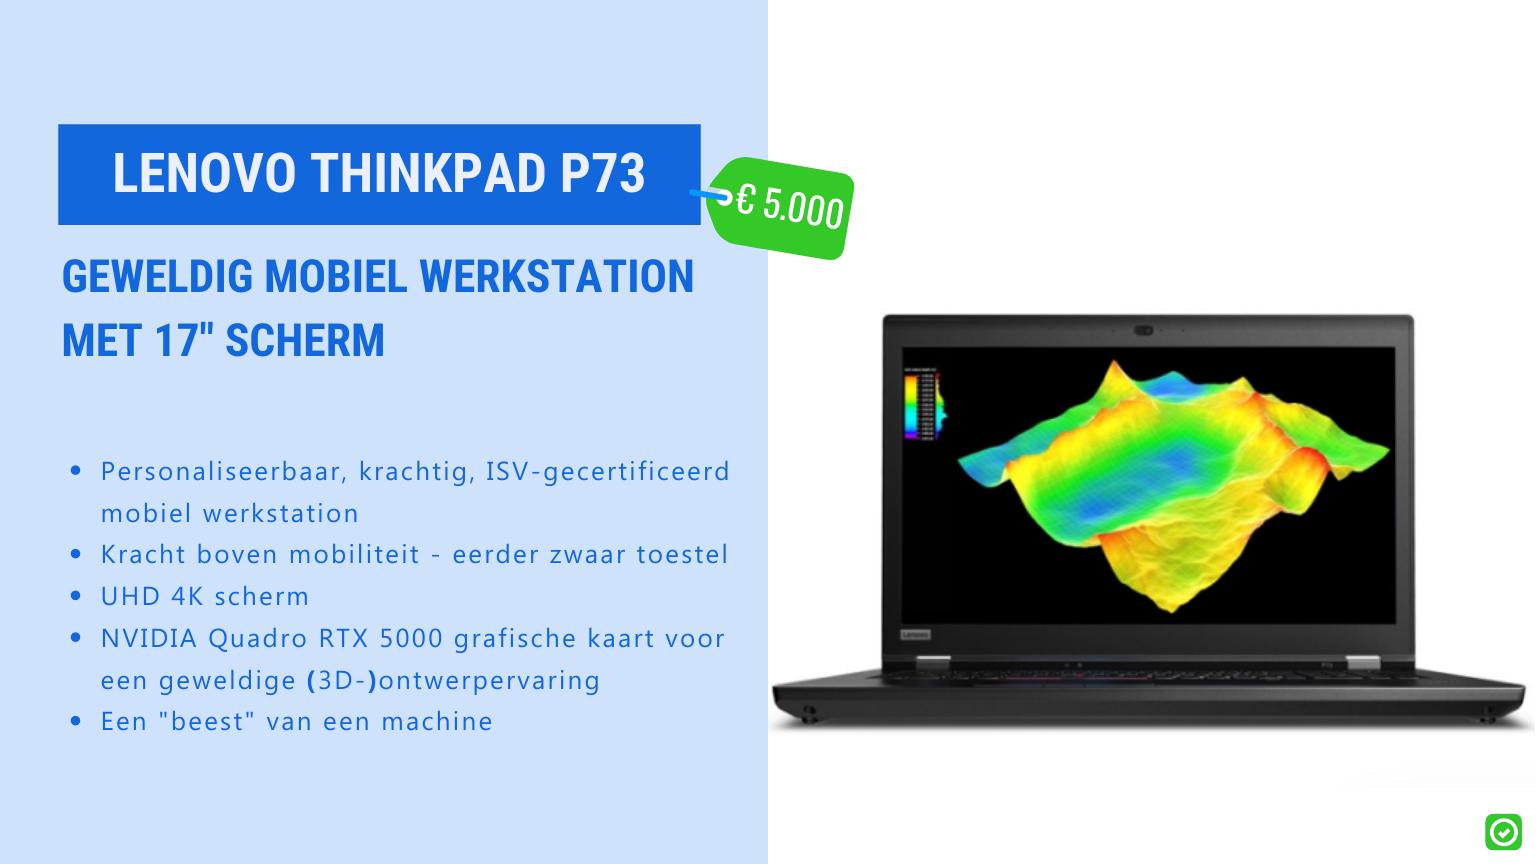 Lenovo thinkpad p73 robuust krachtige laptop voor architect